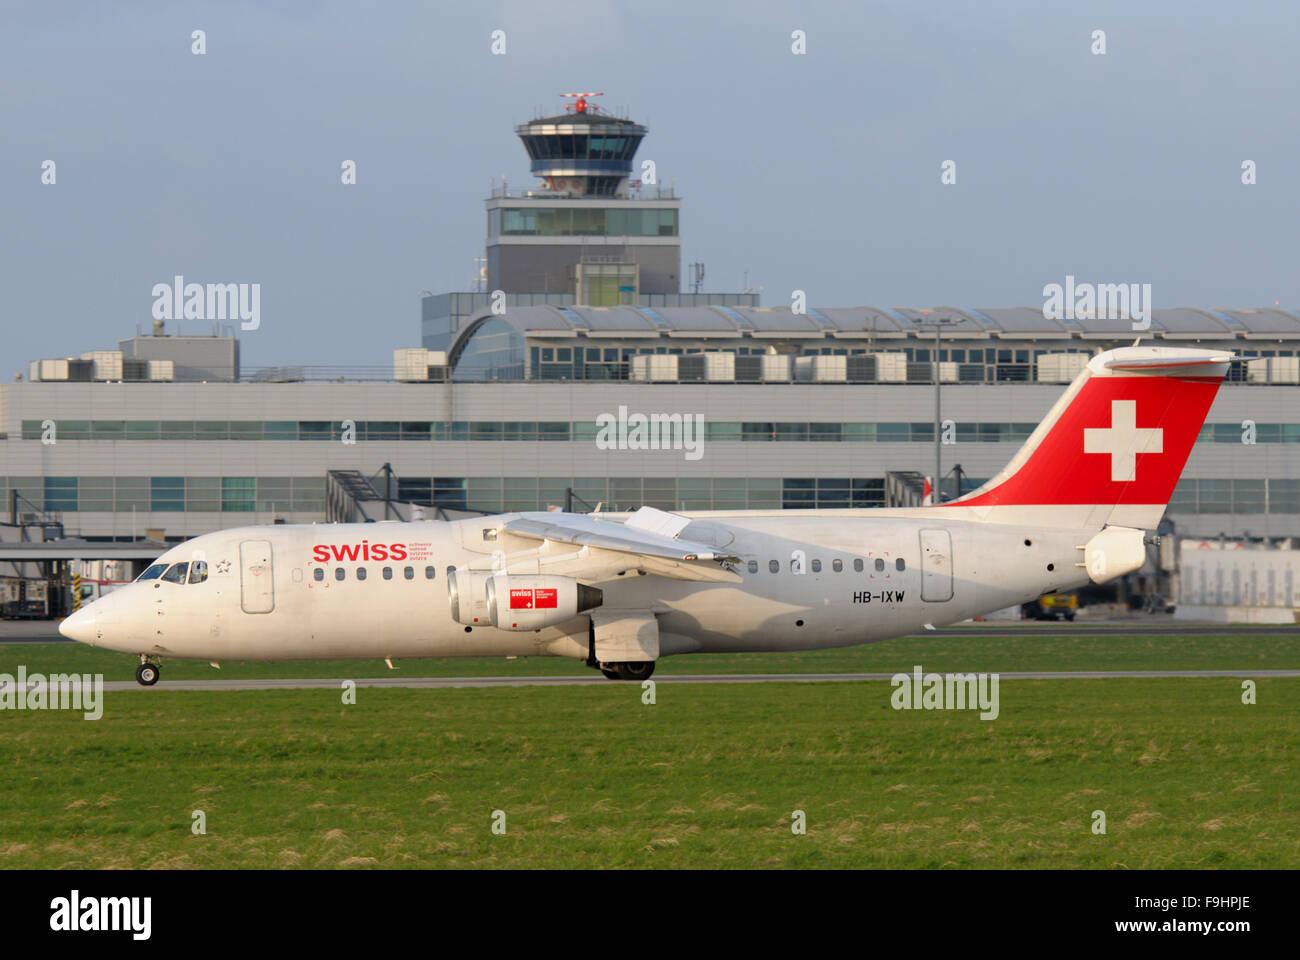 Swiss International BAe 146 - Stock Image